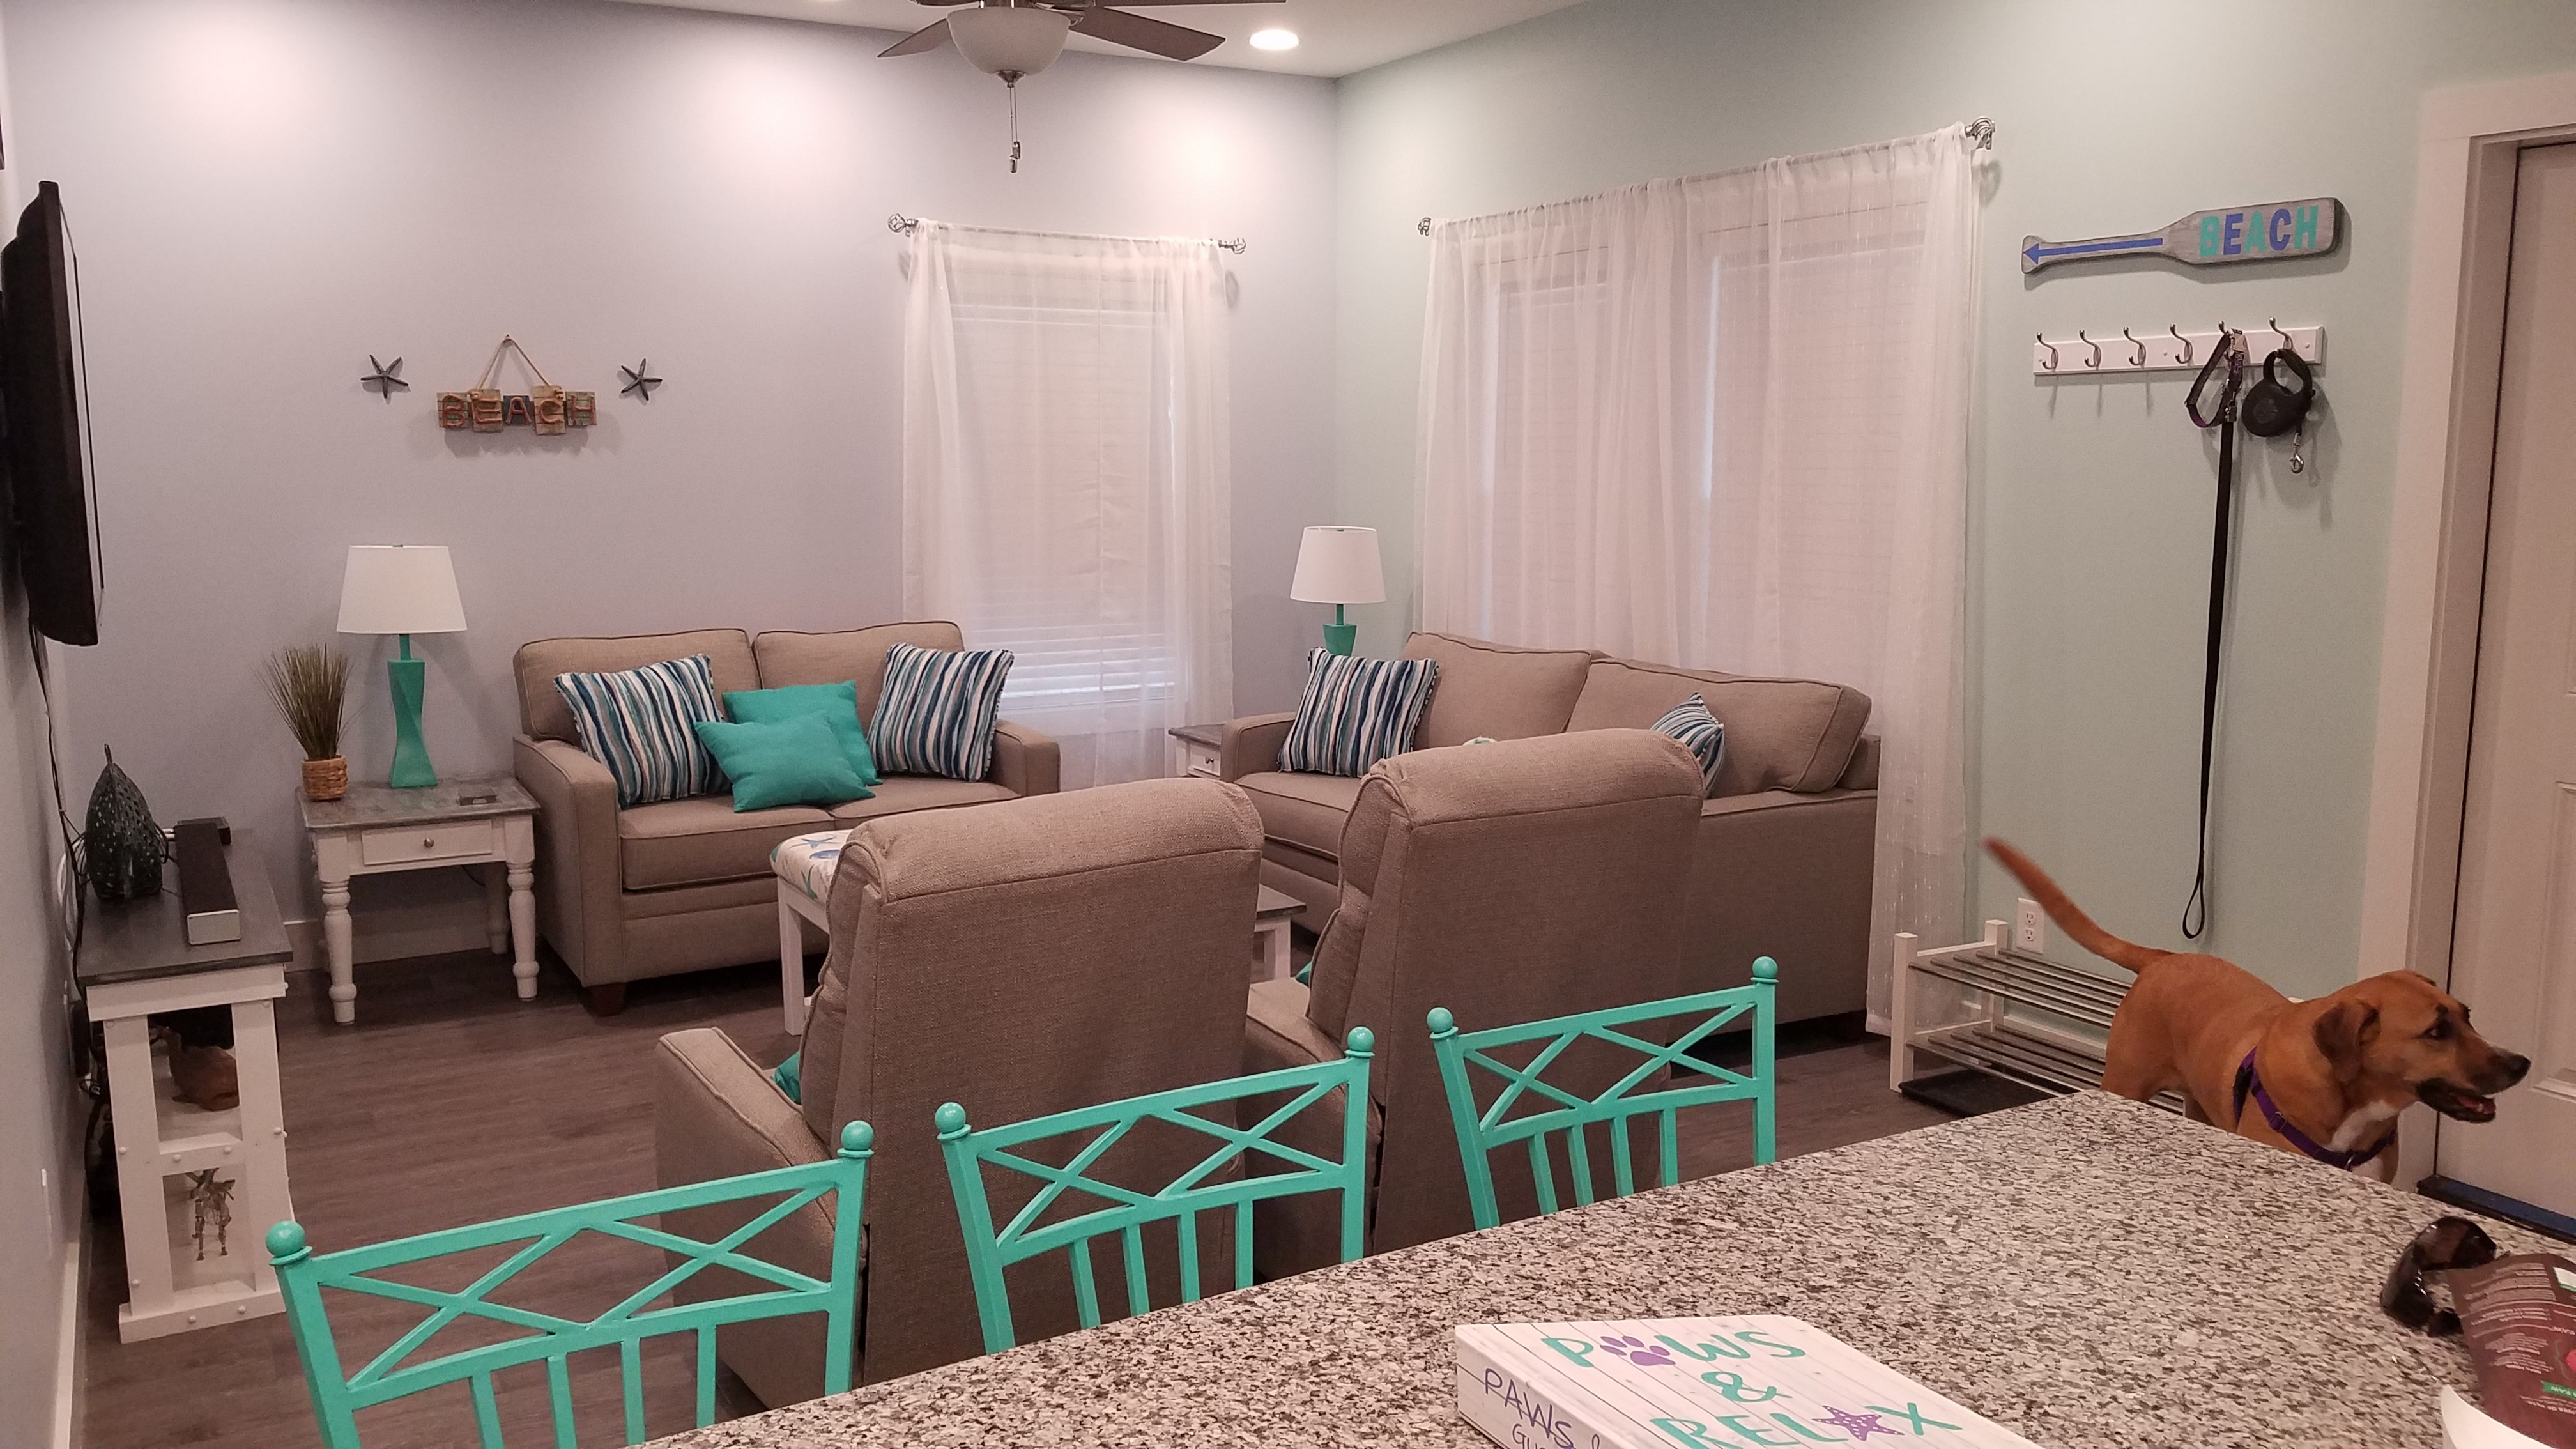 affinity custom modular home interior